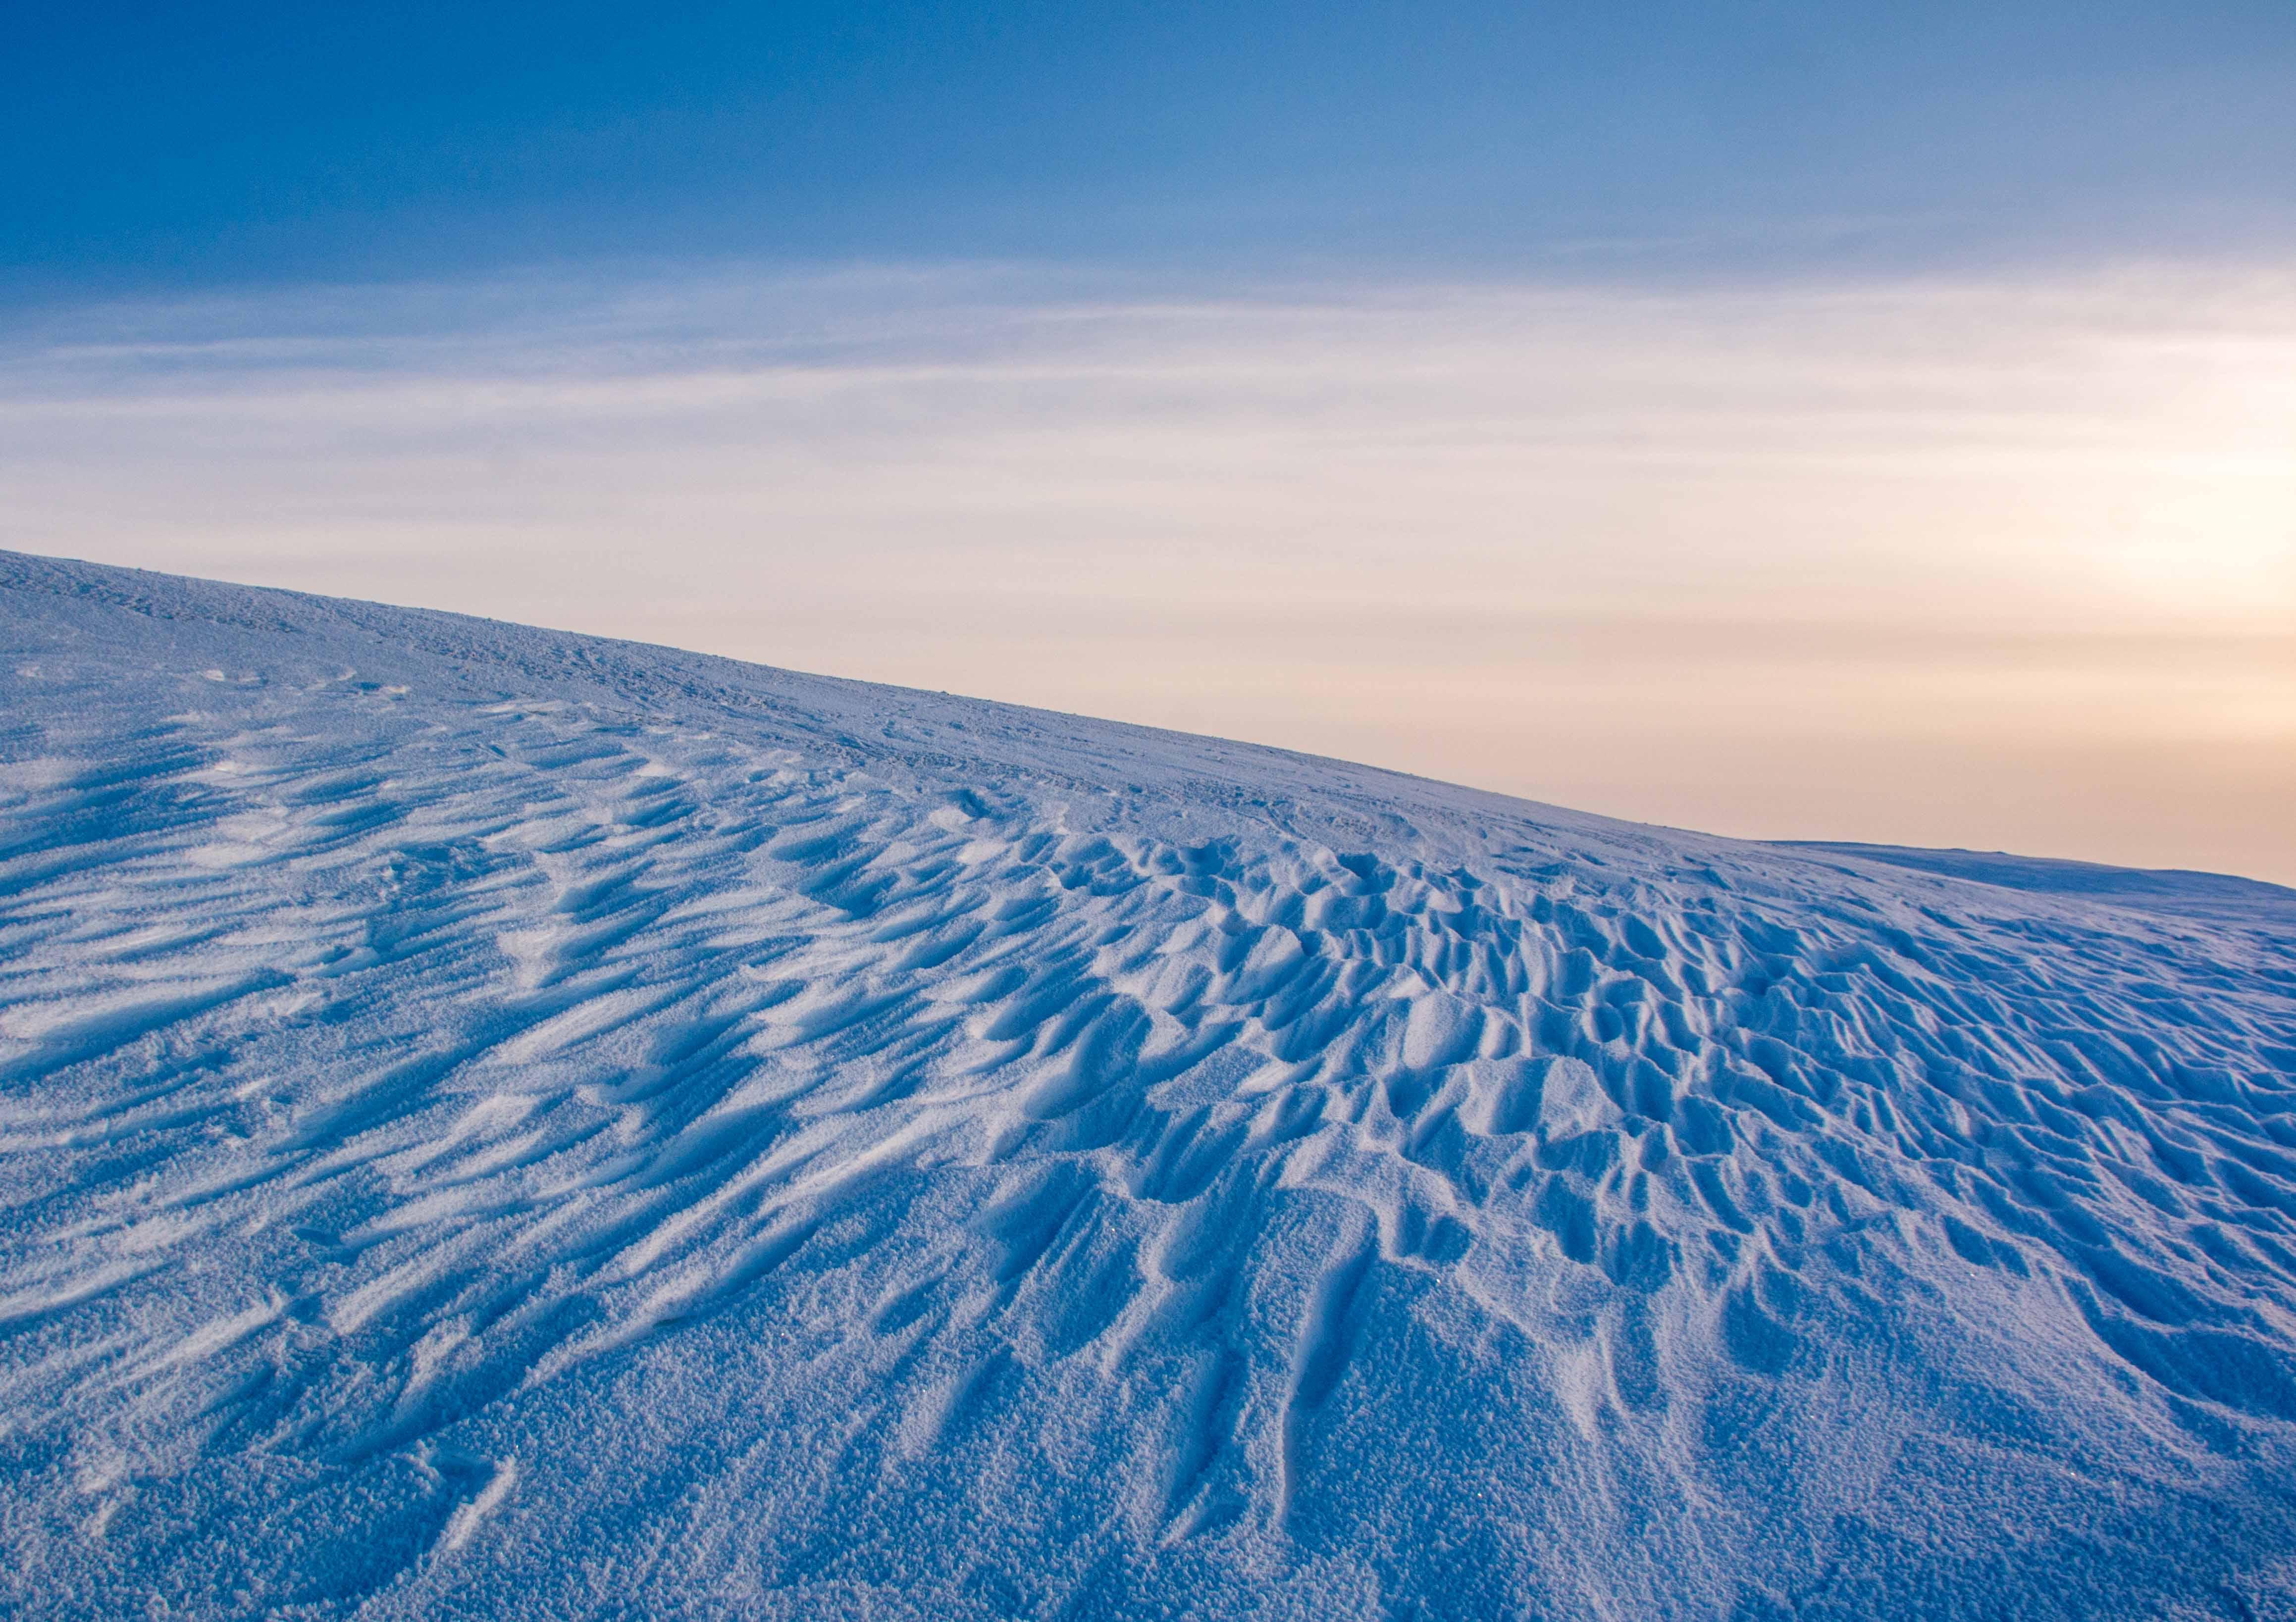 Wind swept snow